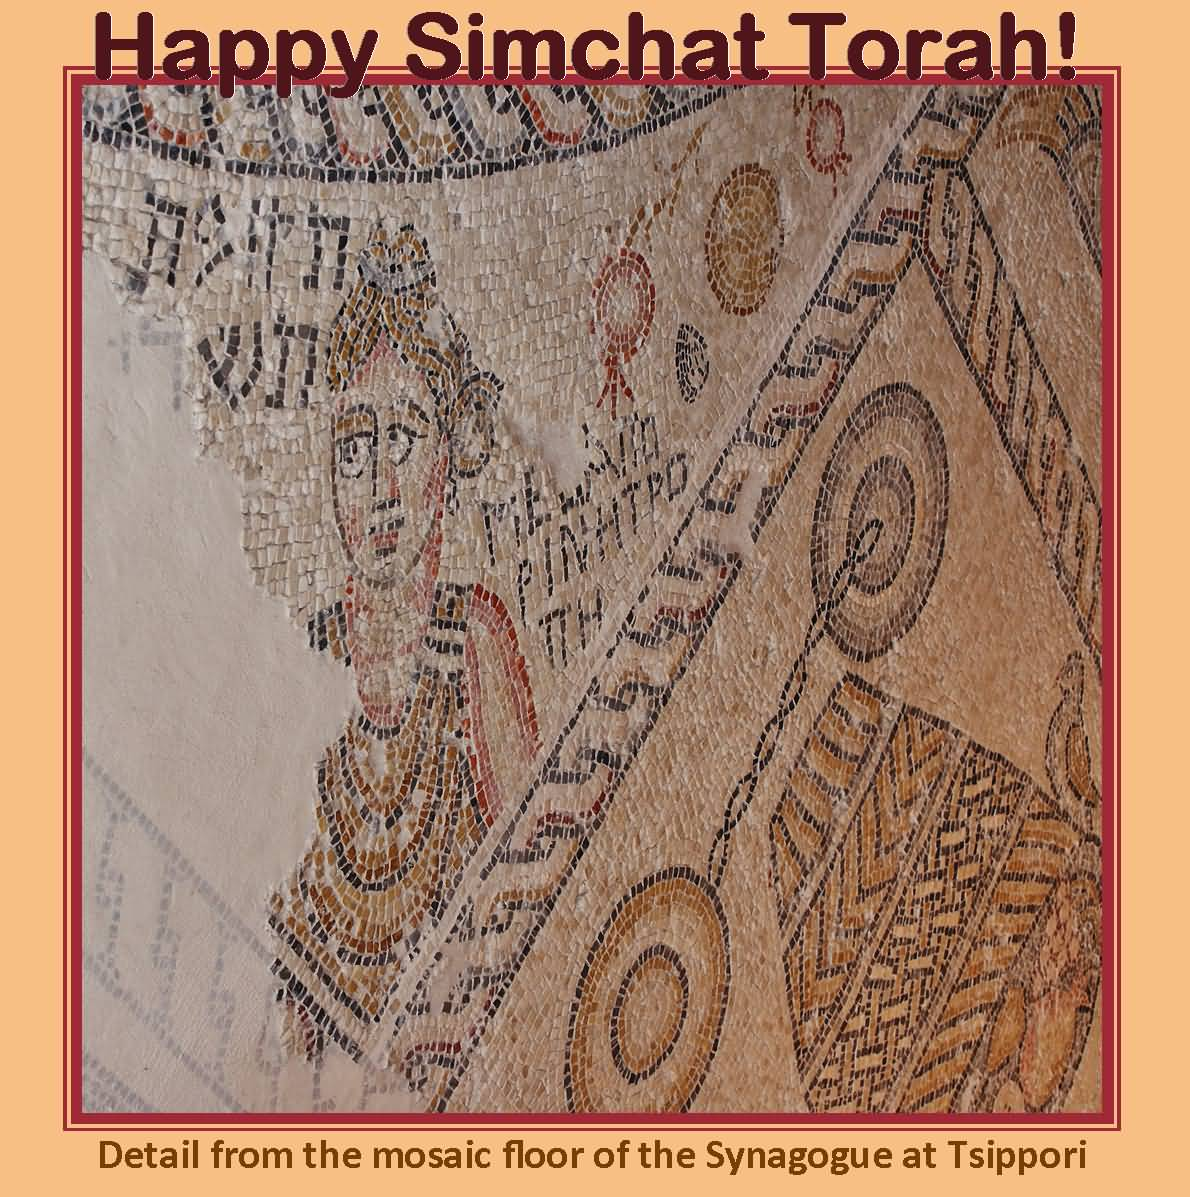 Simchat Torah Blessings Greeting Card